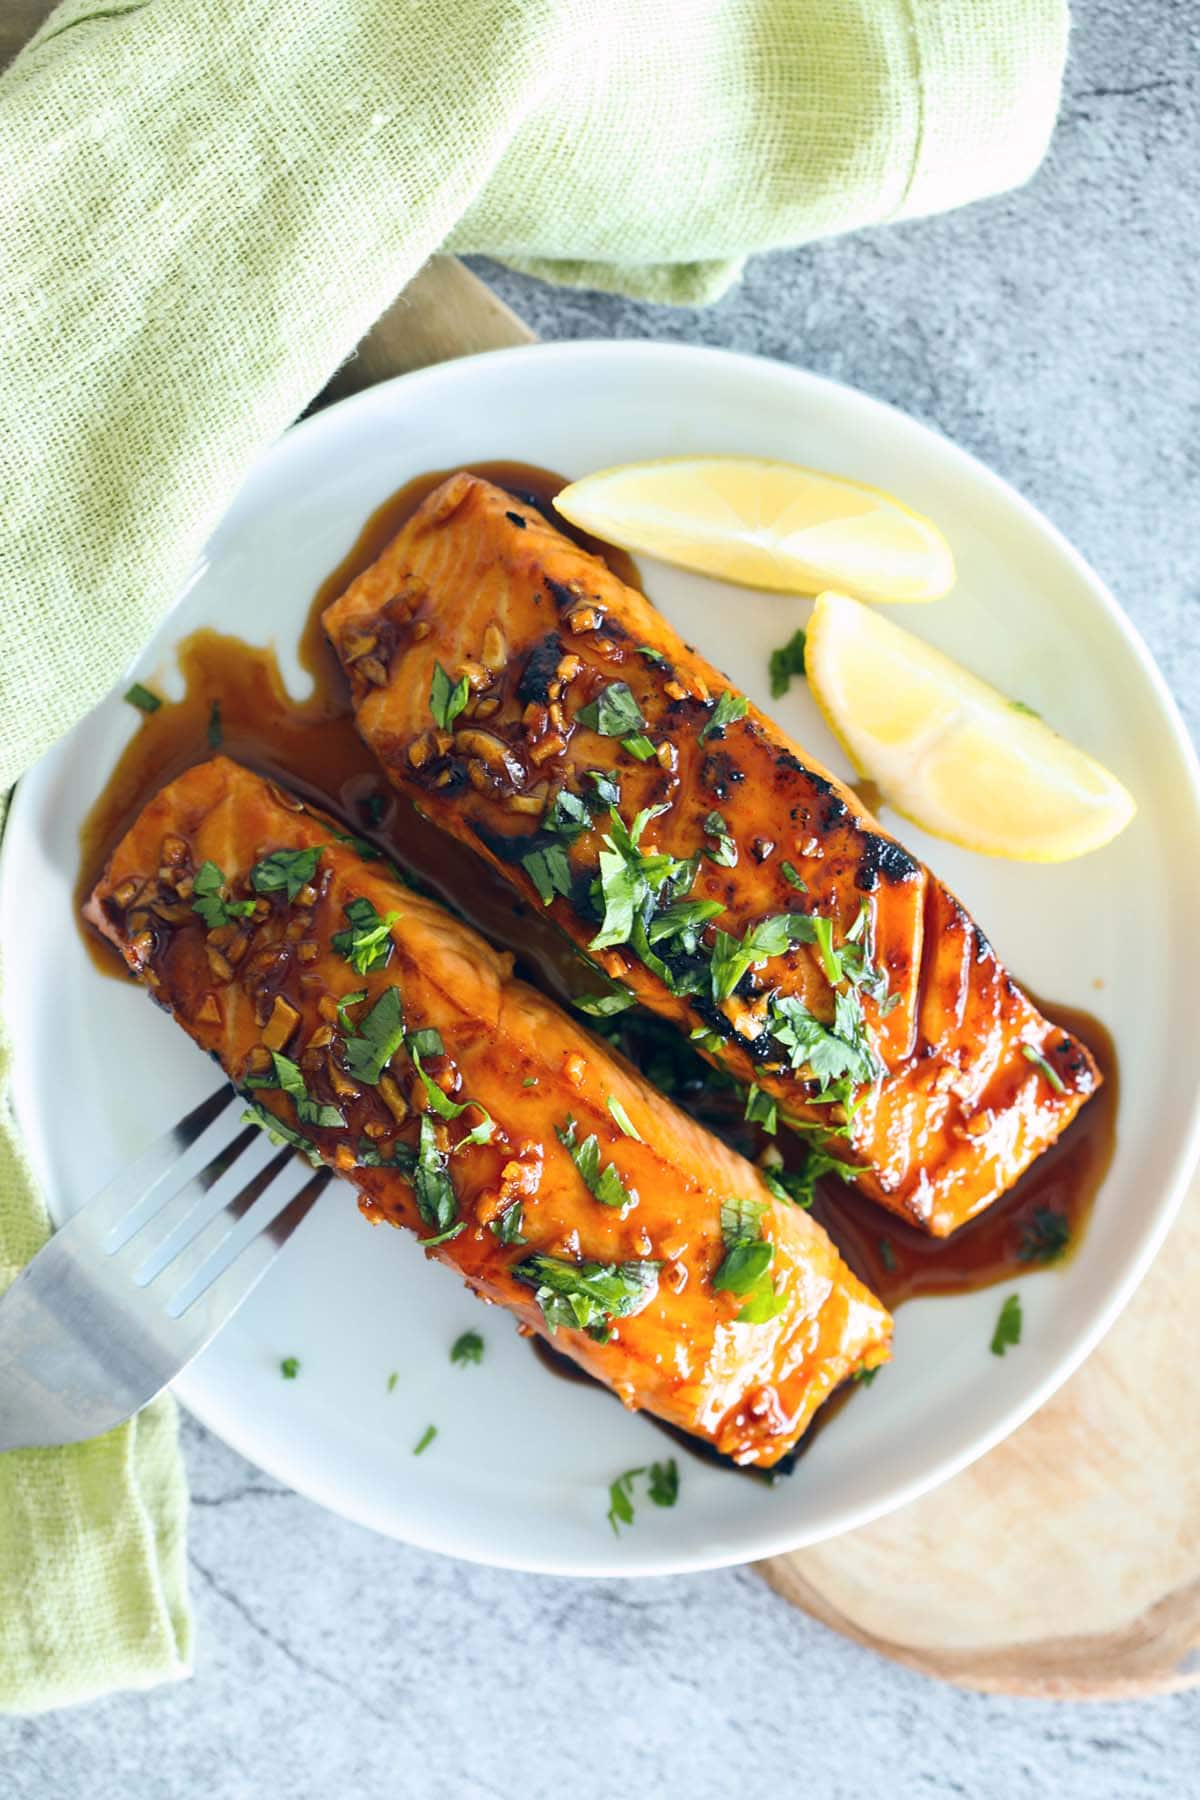 Honey sriracha salmon served on a plate.